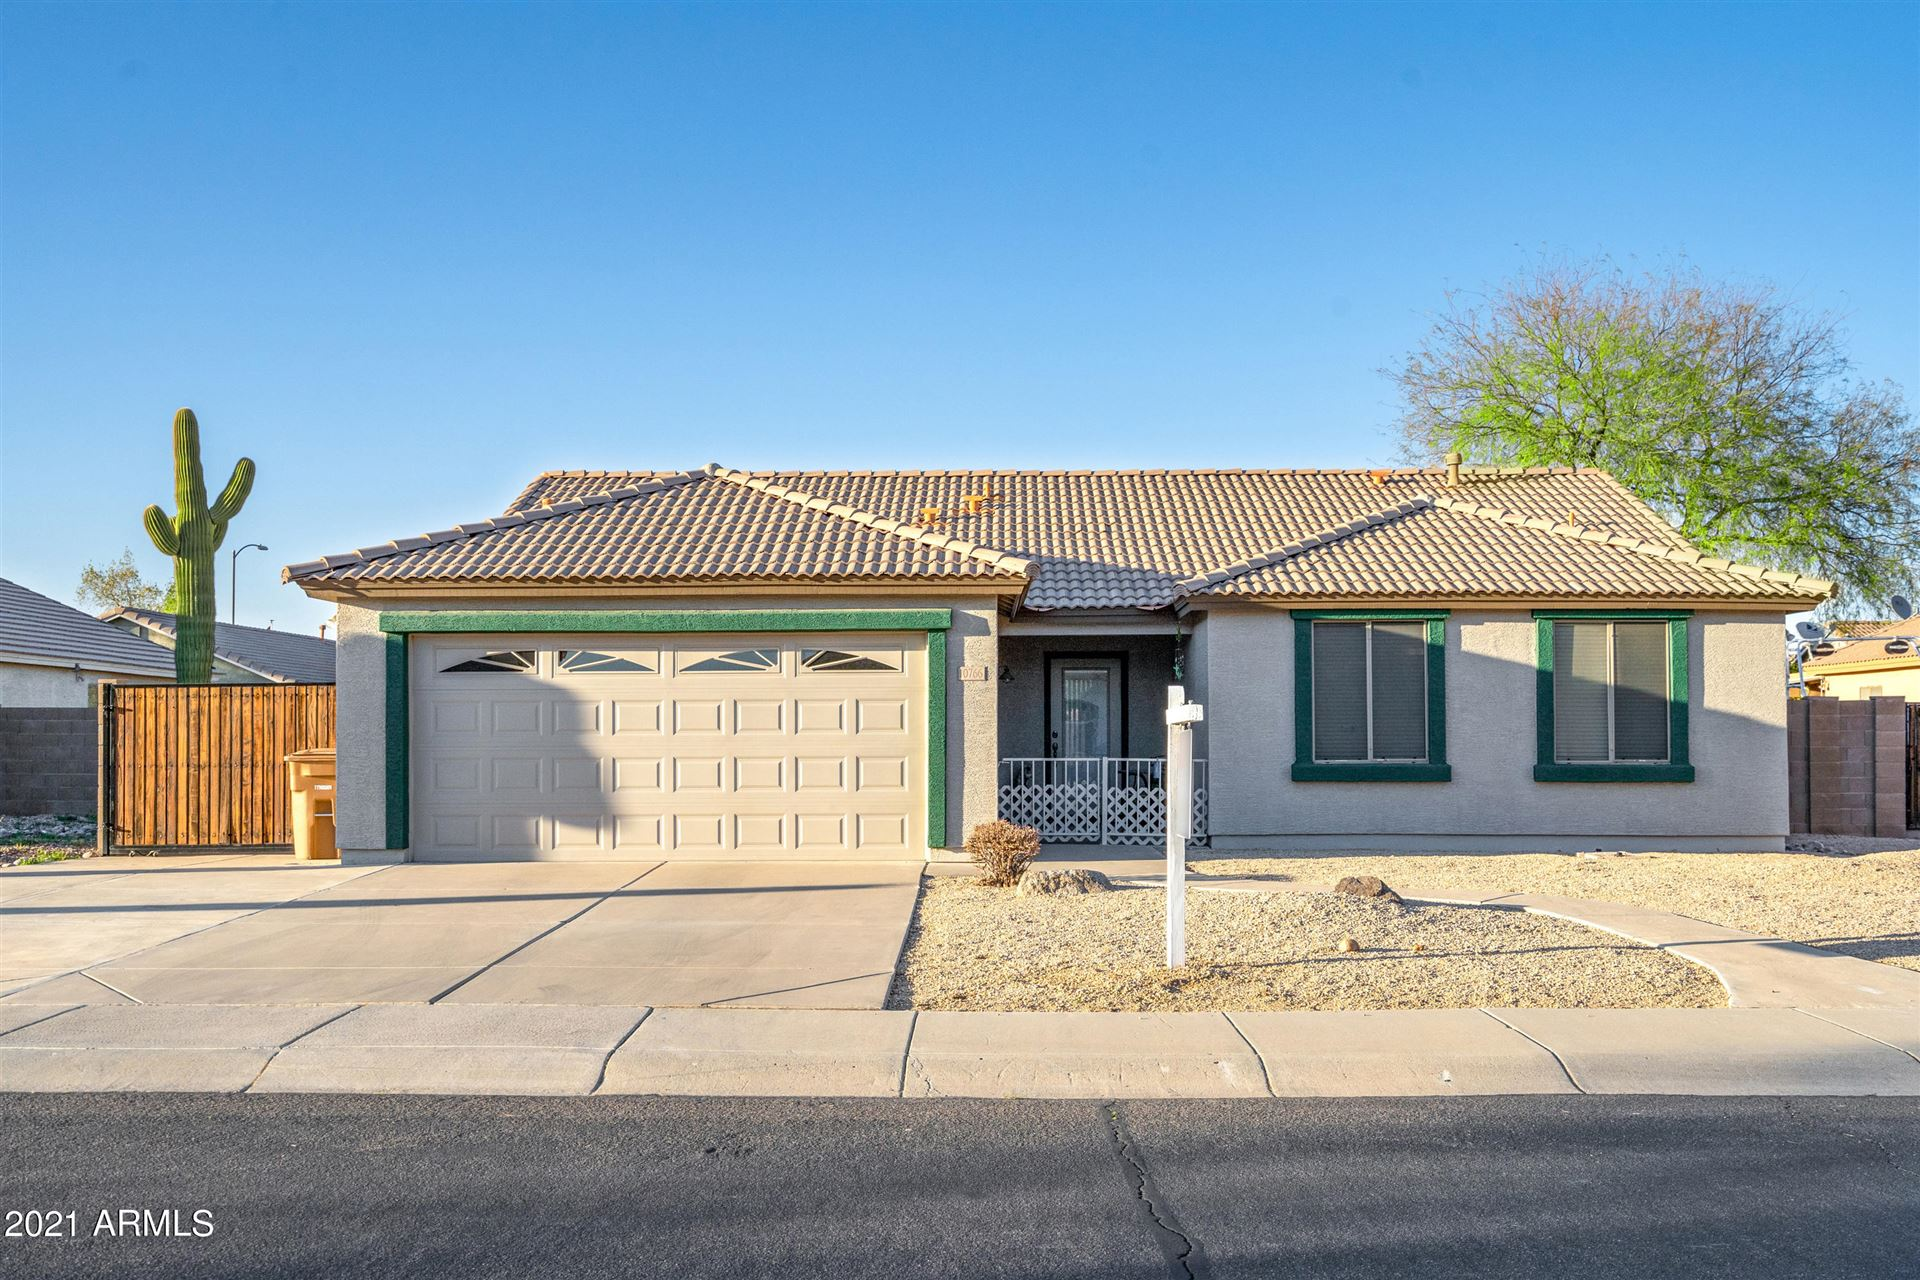 Photo of 10766 W ANGELS Lane, Sun City, AZ 85373 (MLS # 6202009)